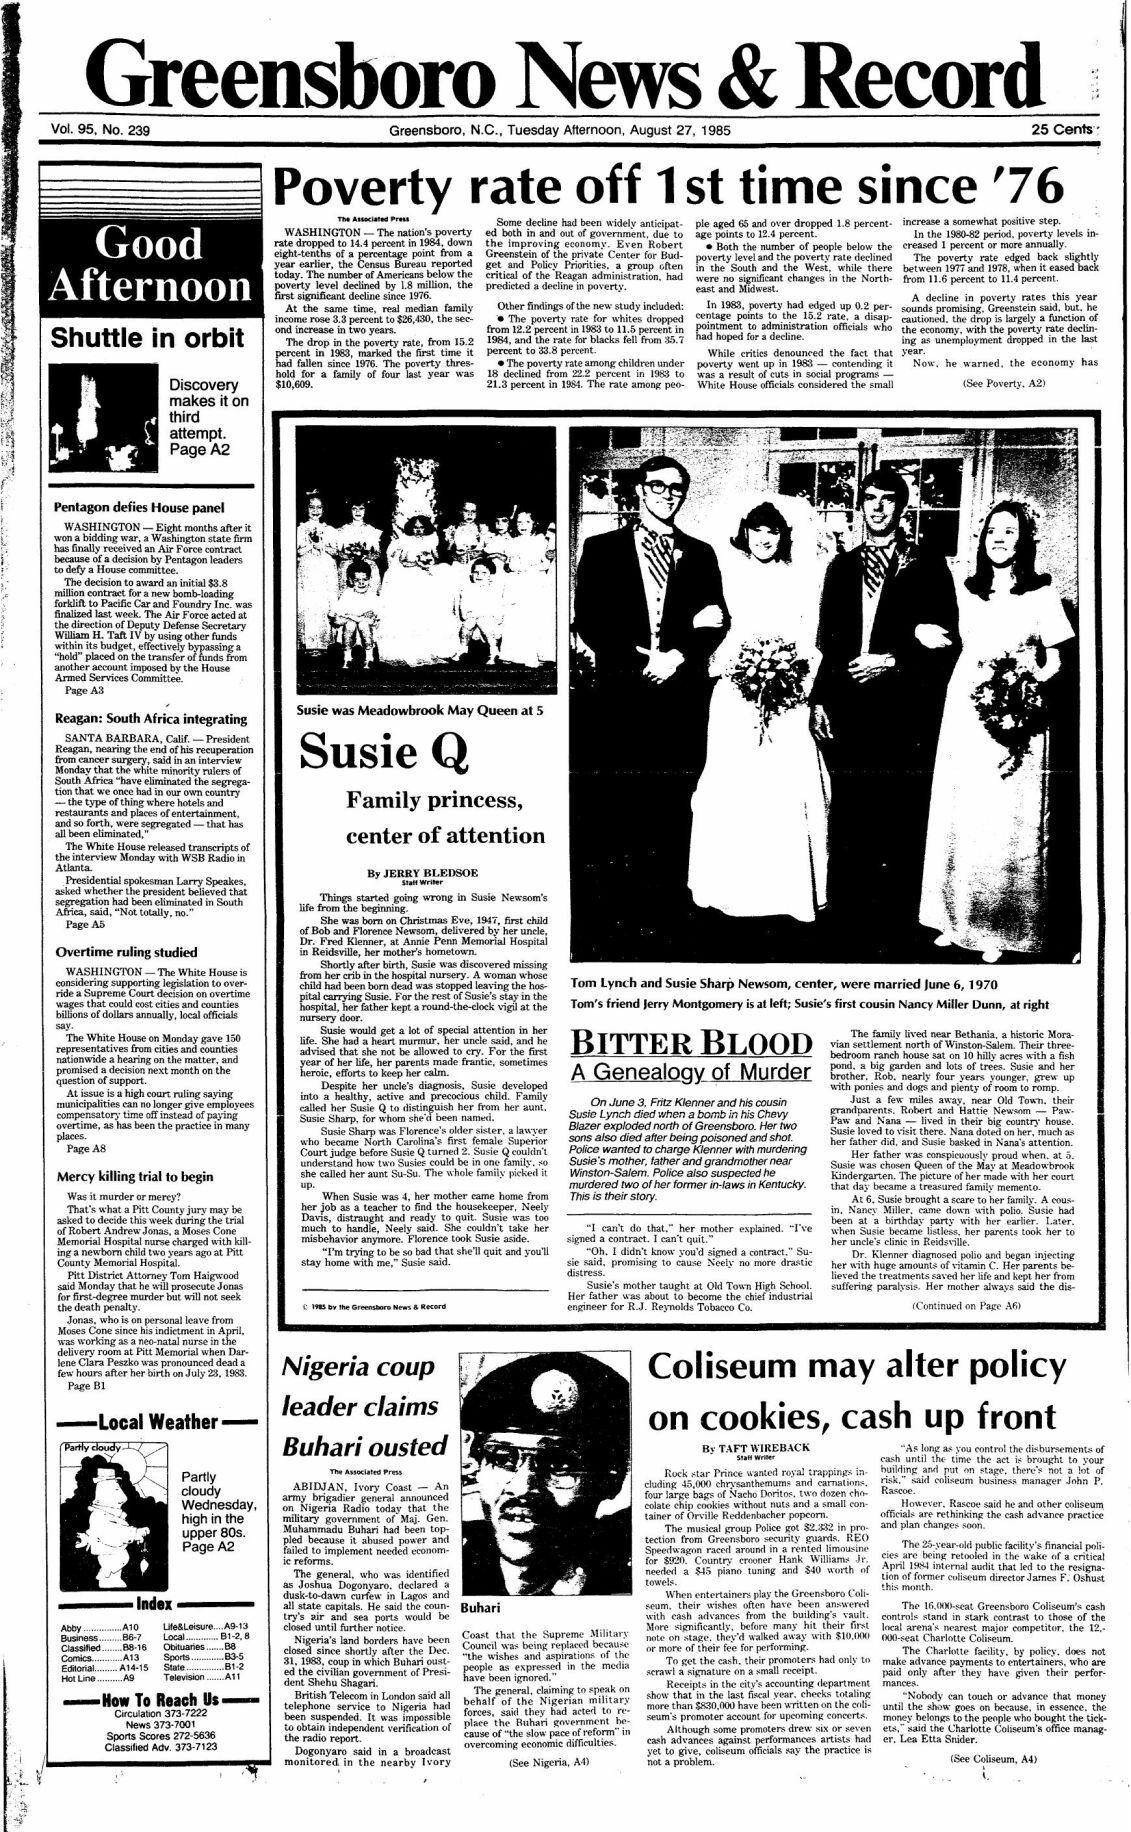 Bitter Blood: Susie Q, family princess